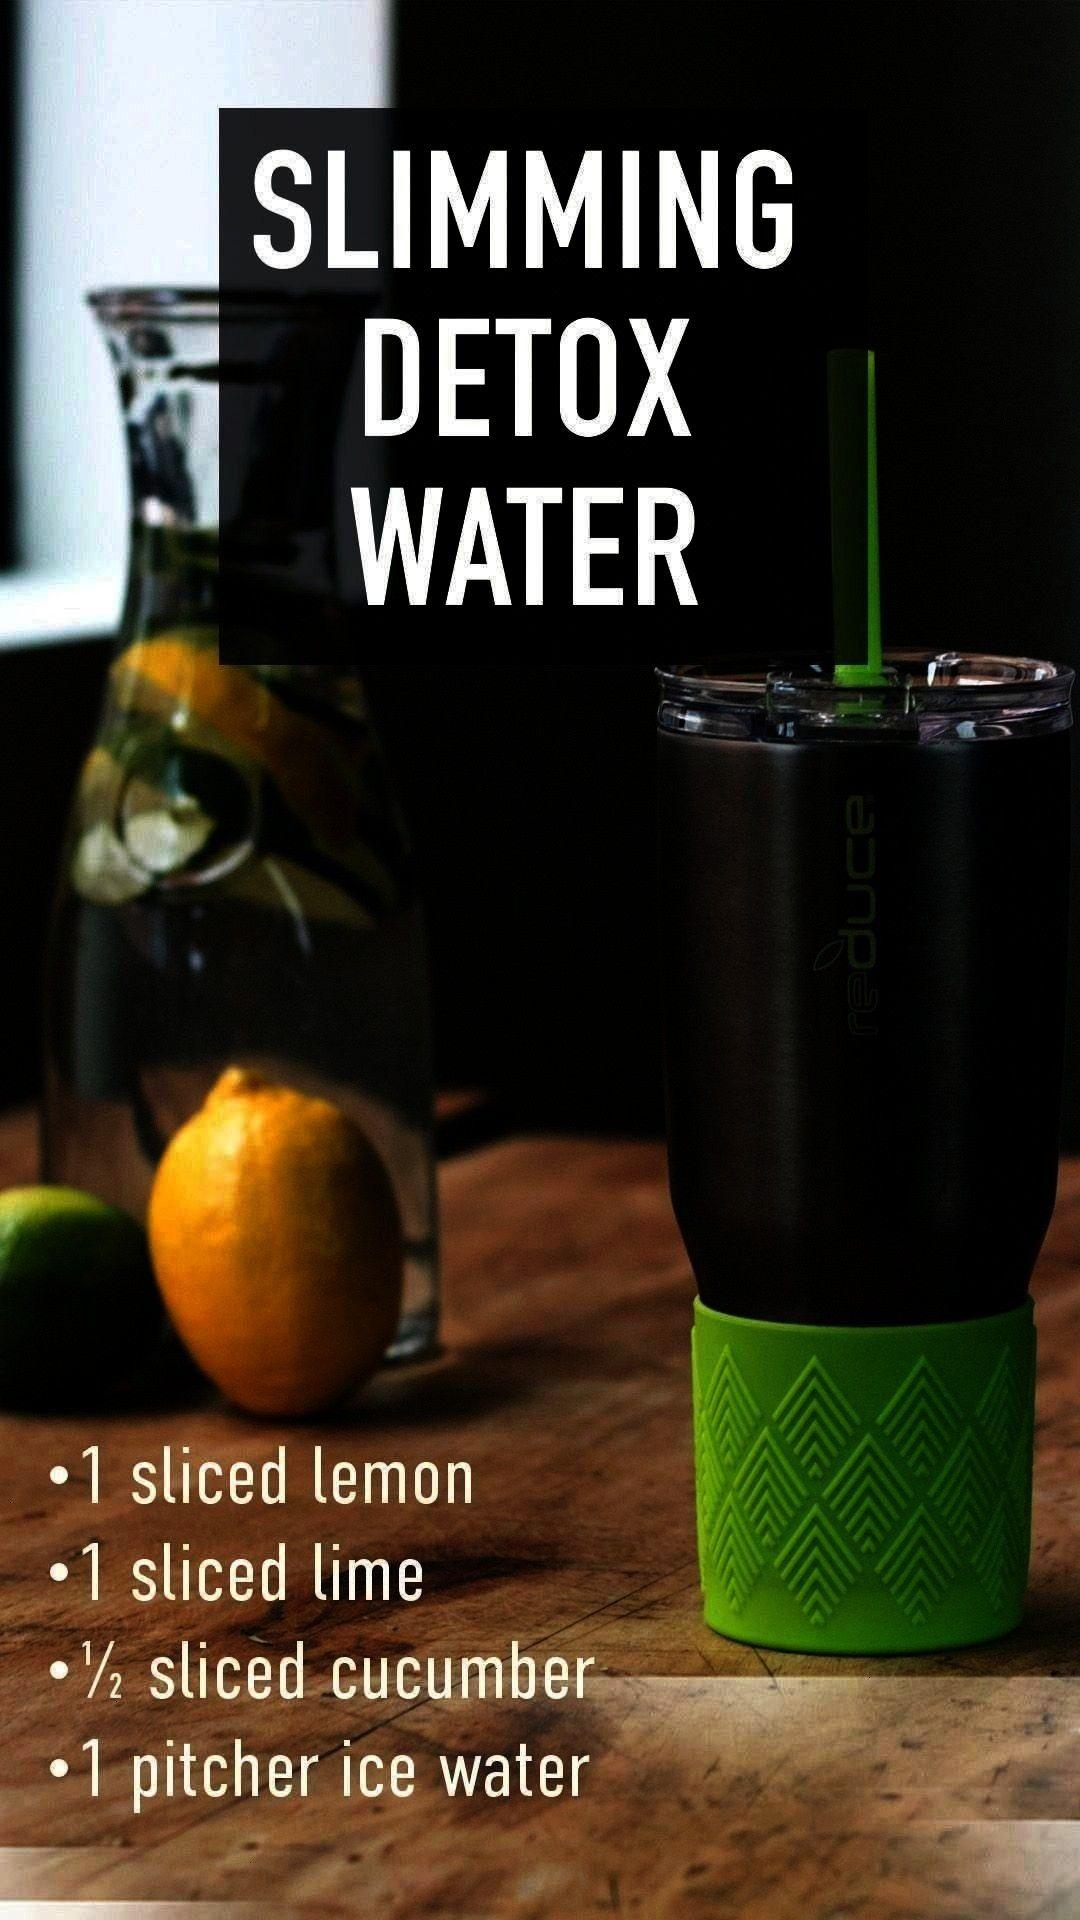 #waterrecipes #waterimprove #detoxtoxins #rejuvenate #detoxwater #boostflush #digestion #improve #fi...